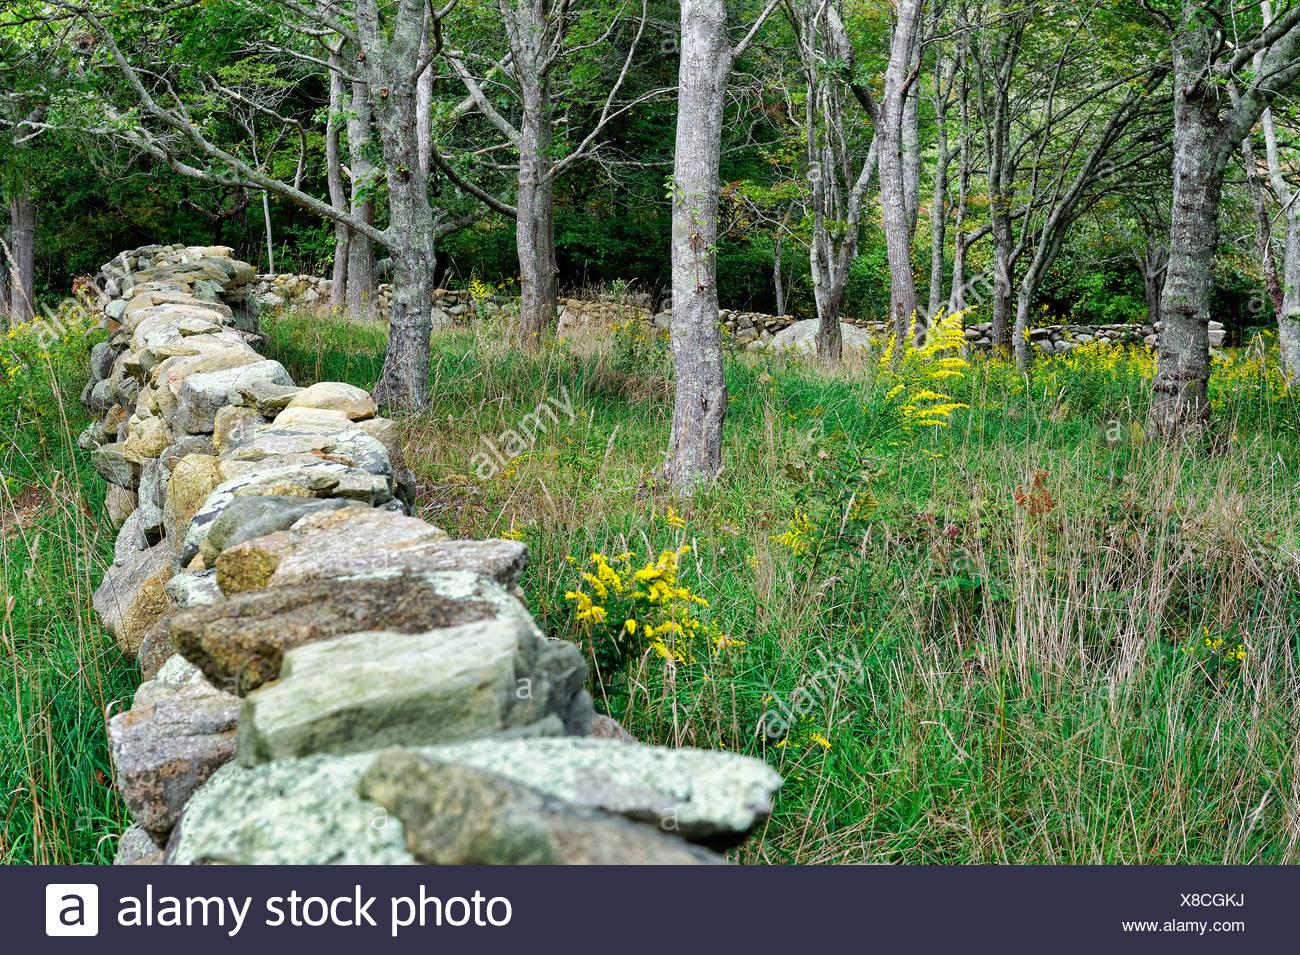 Field and stone fence, Chilmark, Martha's Vineyard, Massachusetts, USA - Stock Image